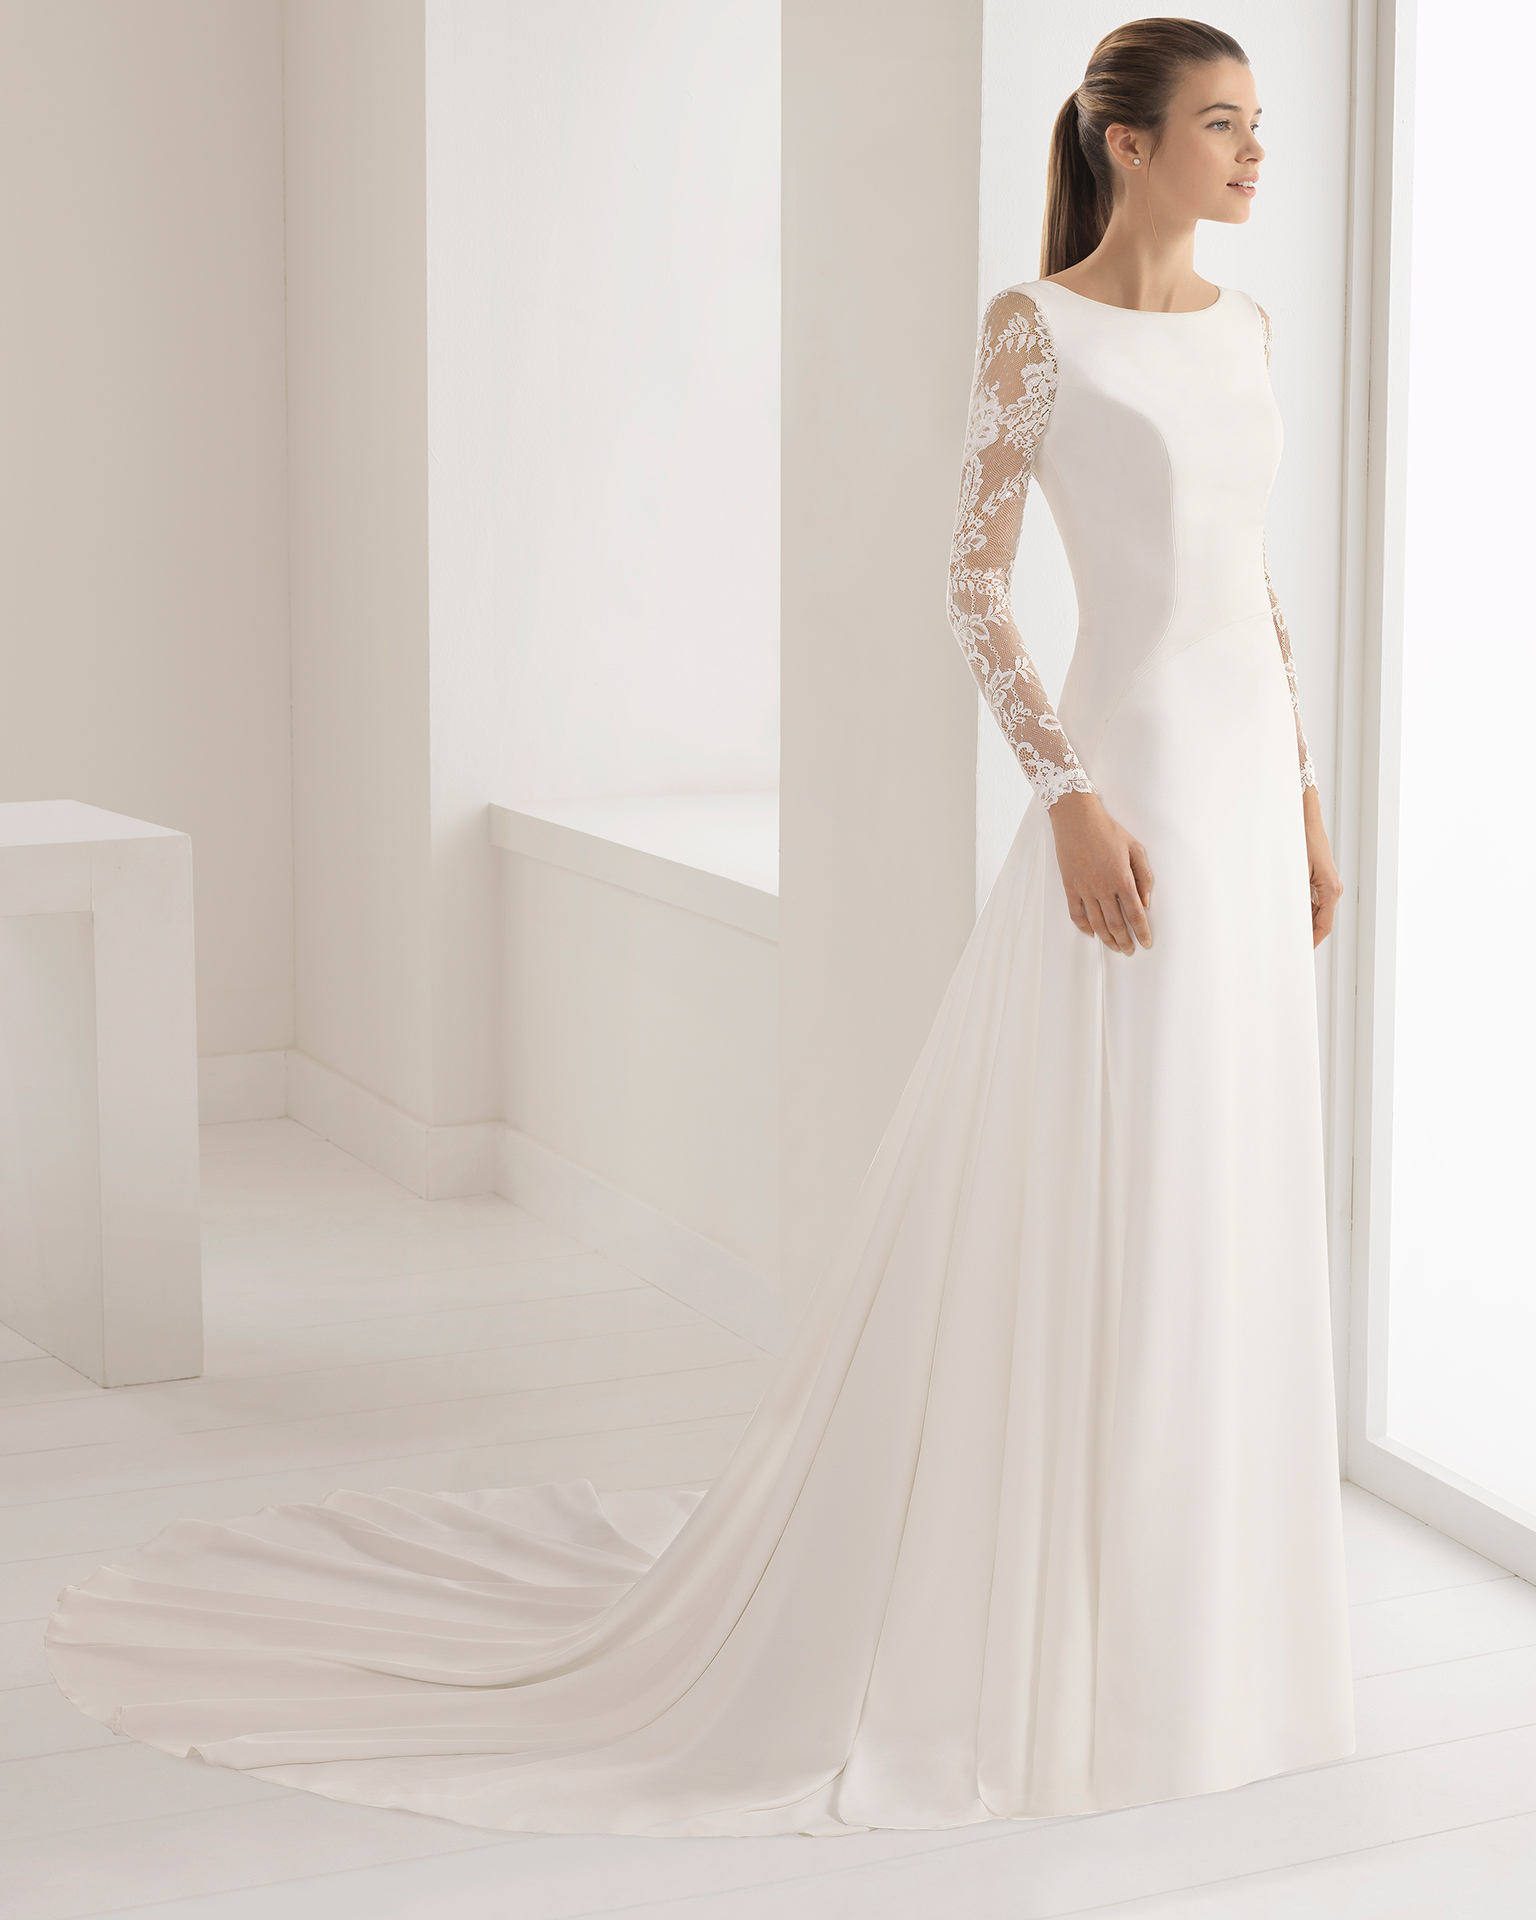 Vestido de noiva estilo clássico de crepe de manga comprida e costas abertas de renda e brilhantes.